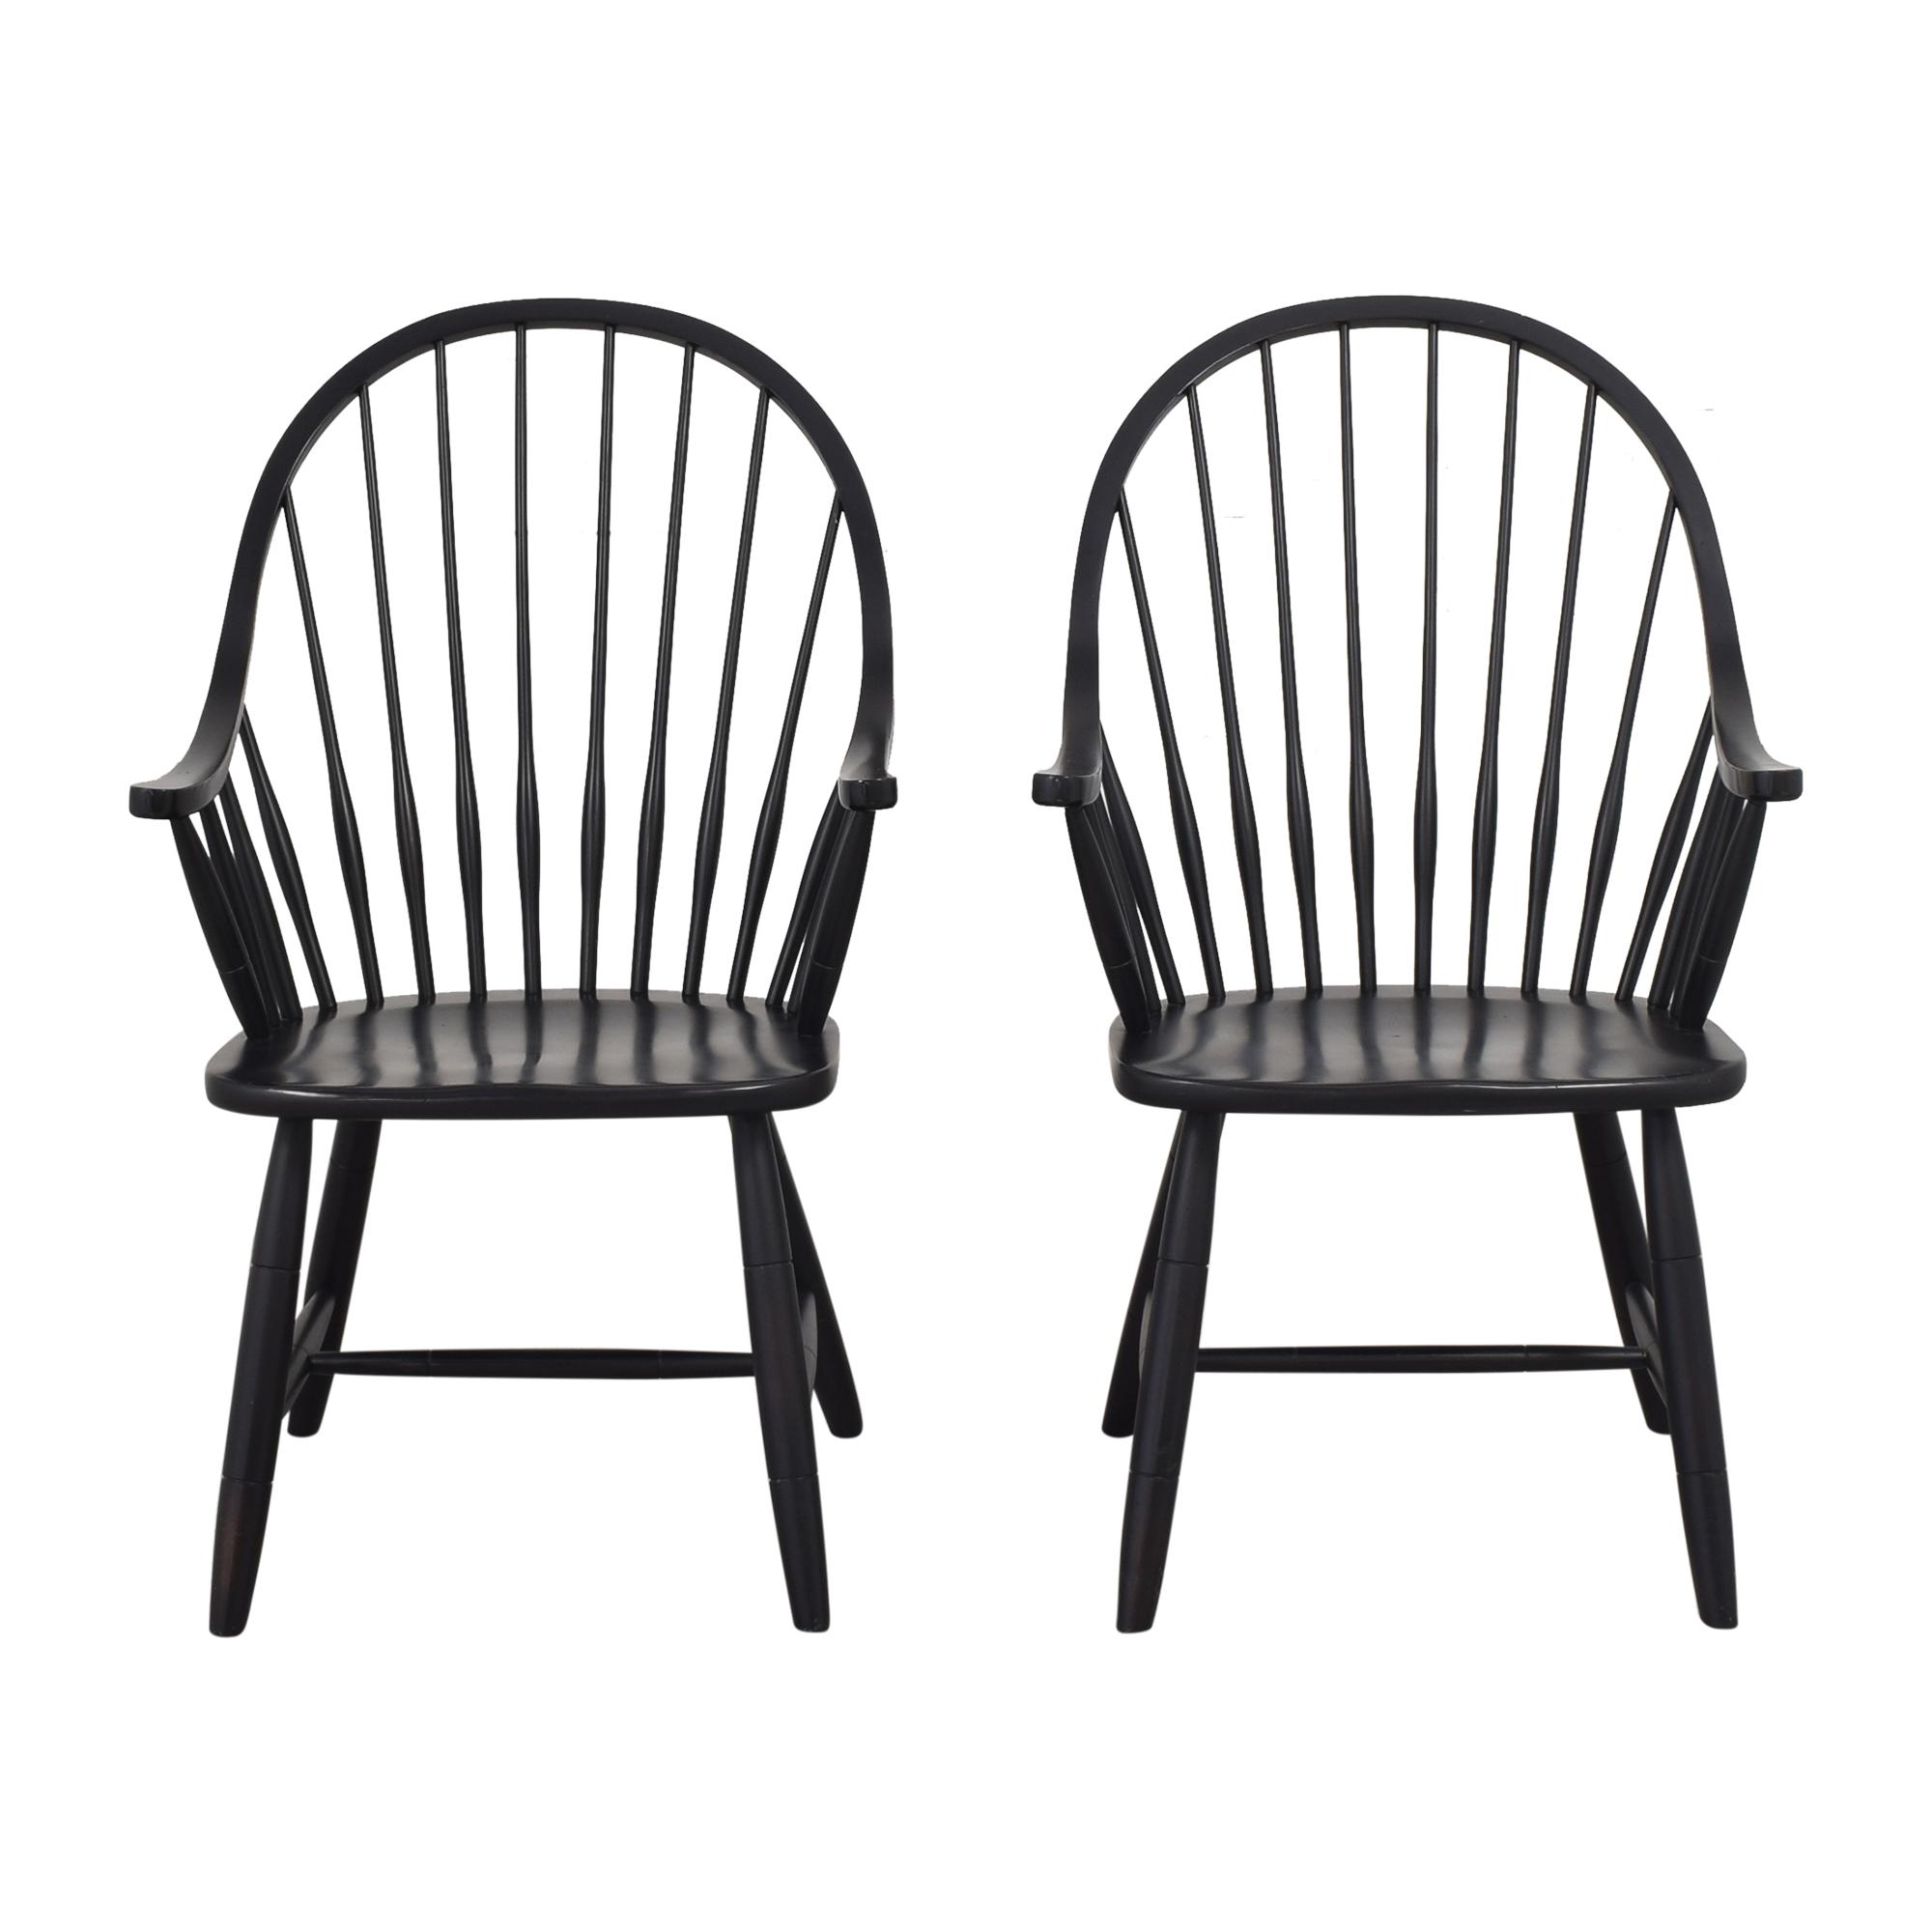 Ethan Allen Gilbert Armchairs / Dining Chairs